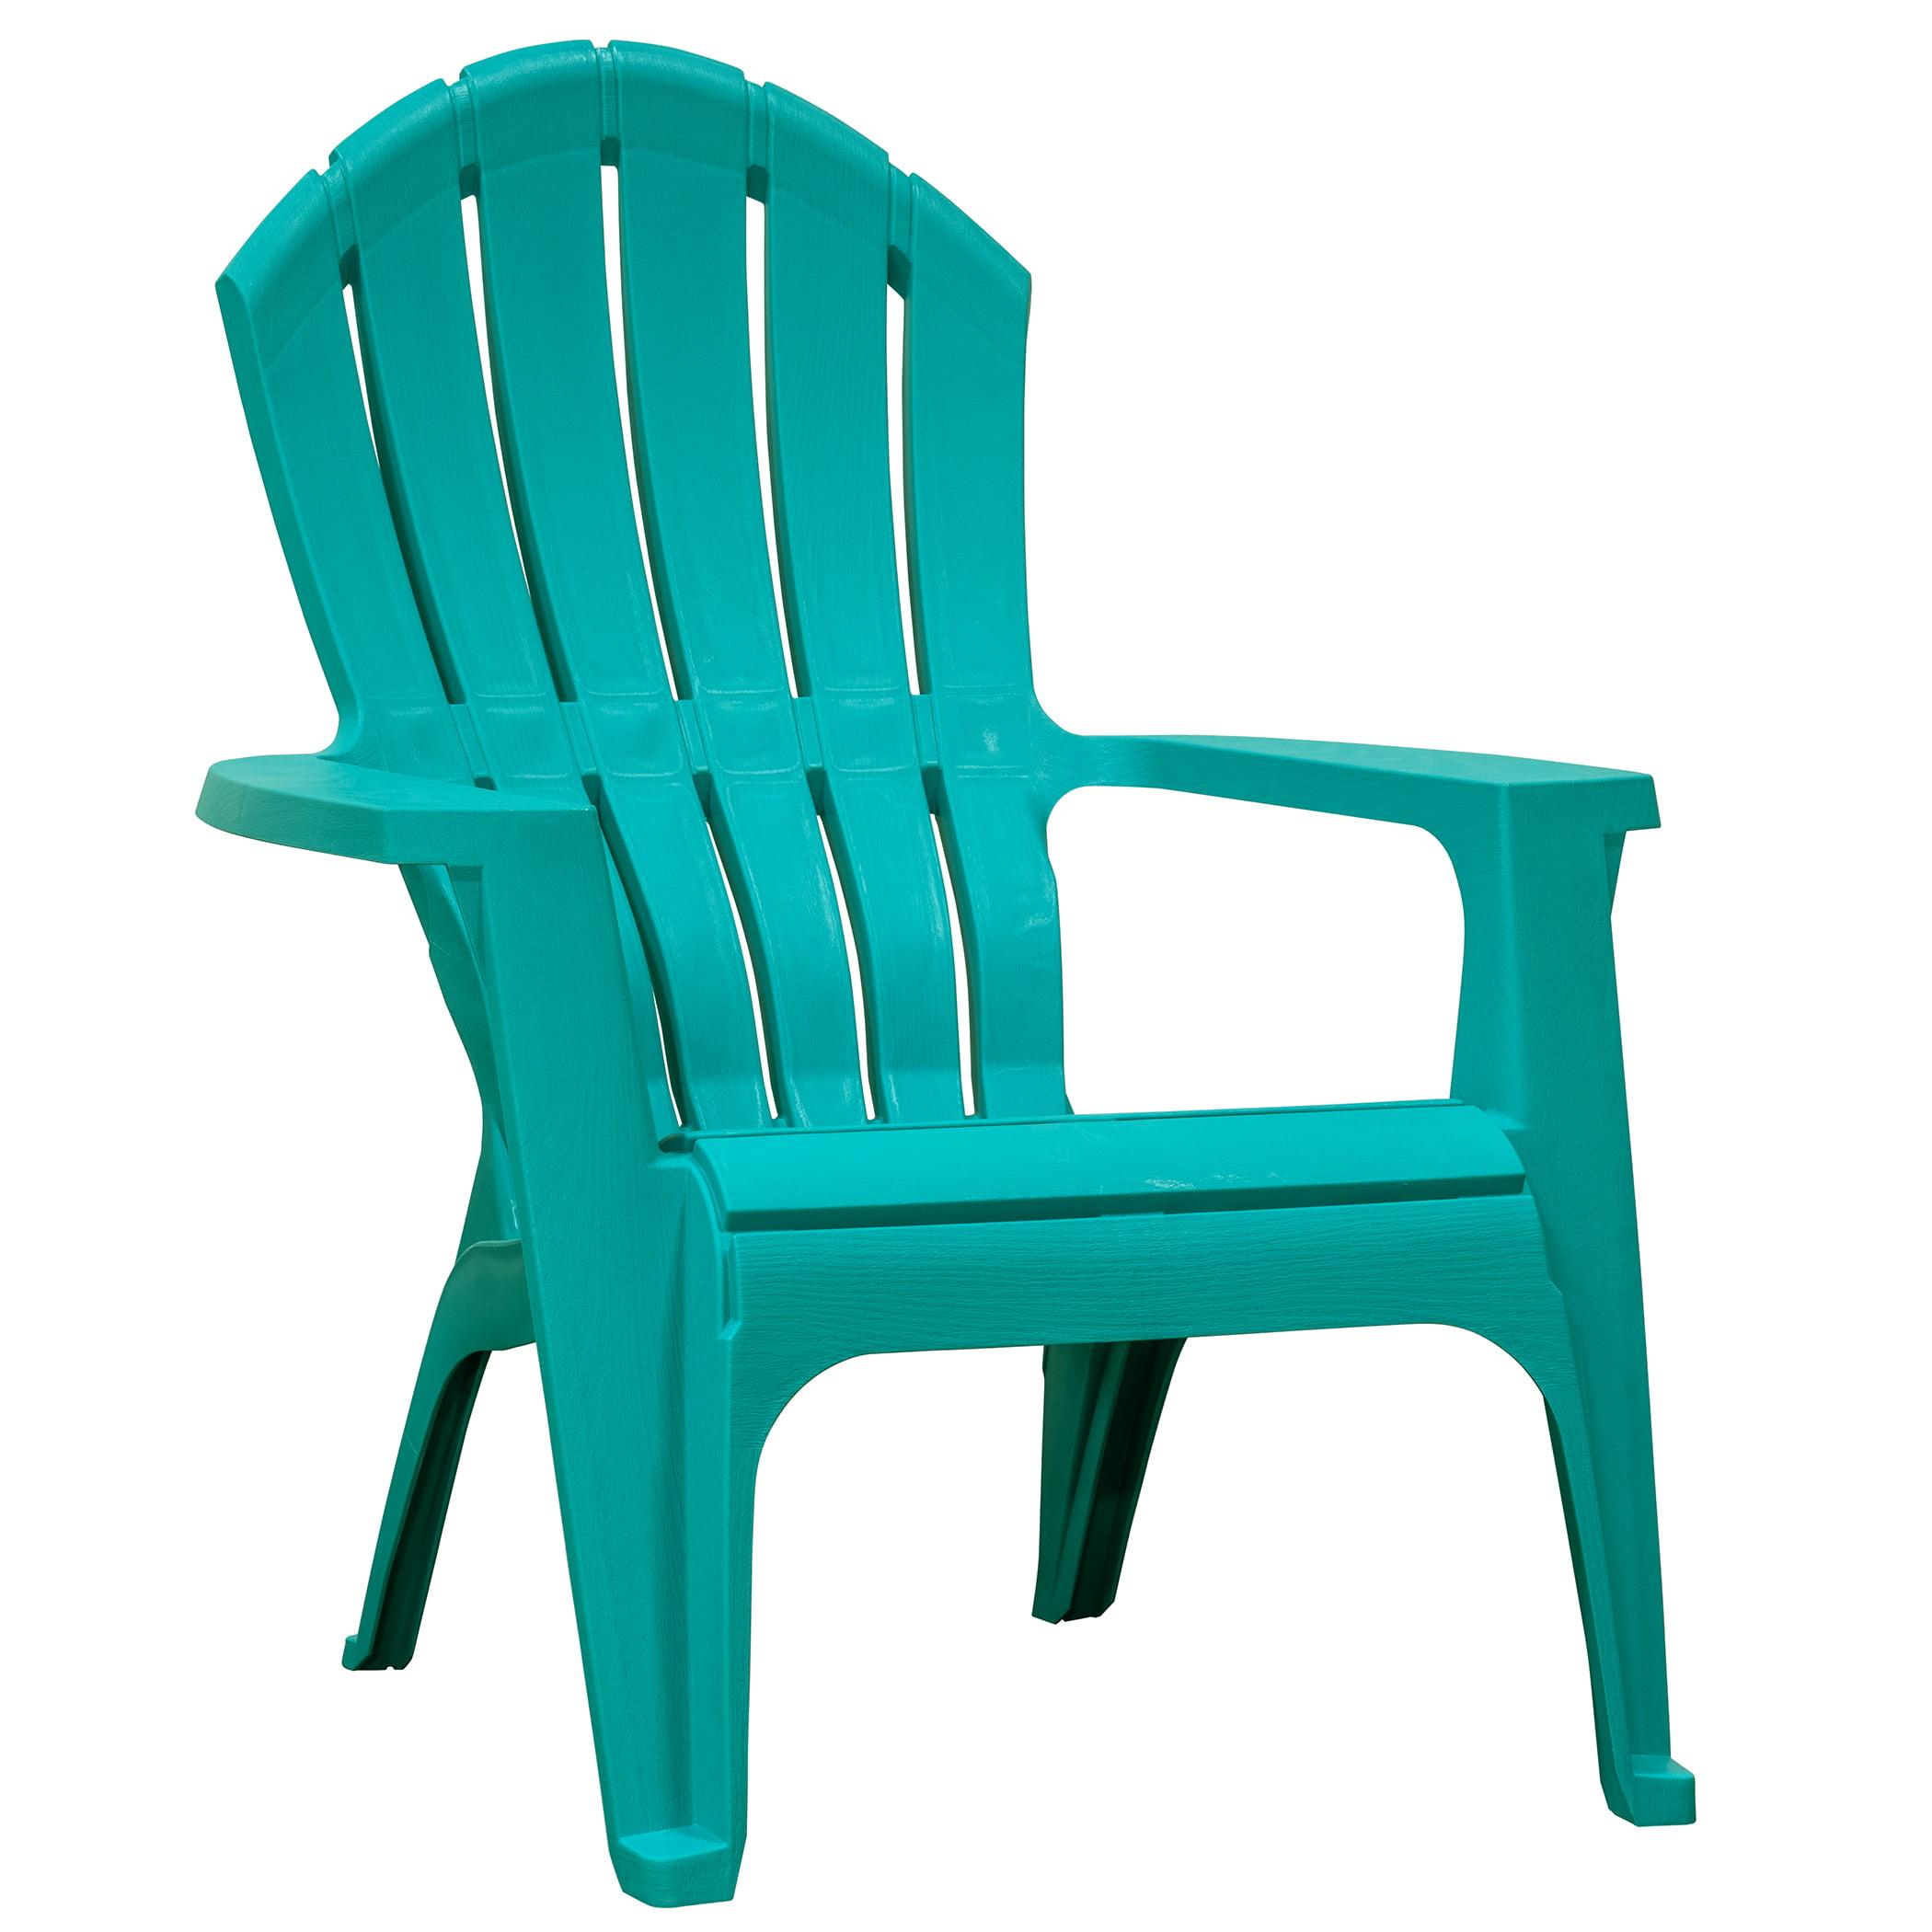 Adams Manufacturing Realcomfort Outdoor Resin Adirondack Chair Teal Walmart Com Walmart Com